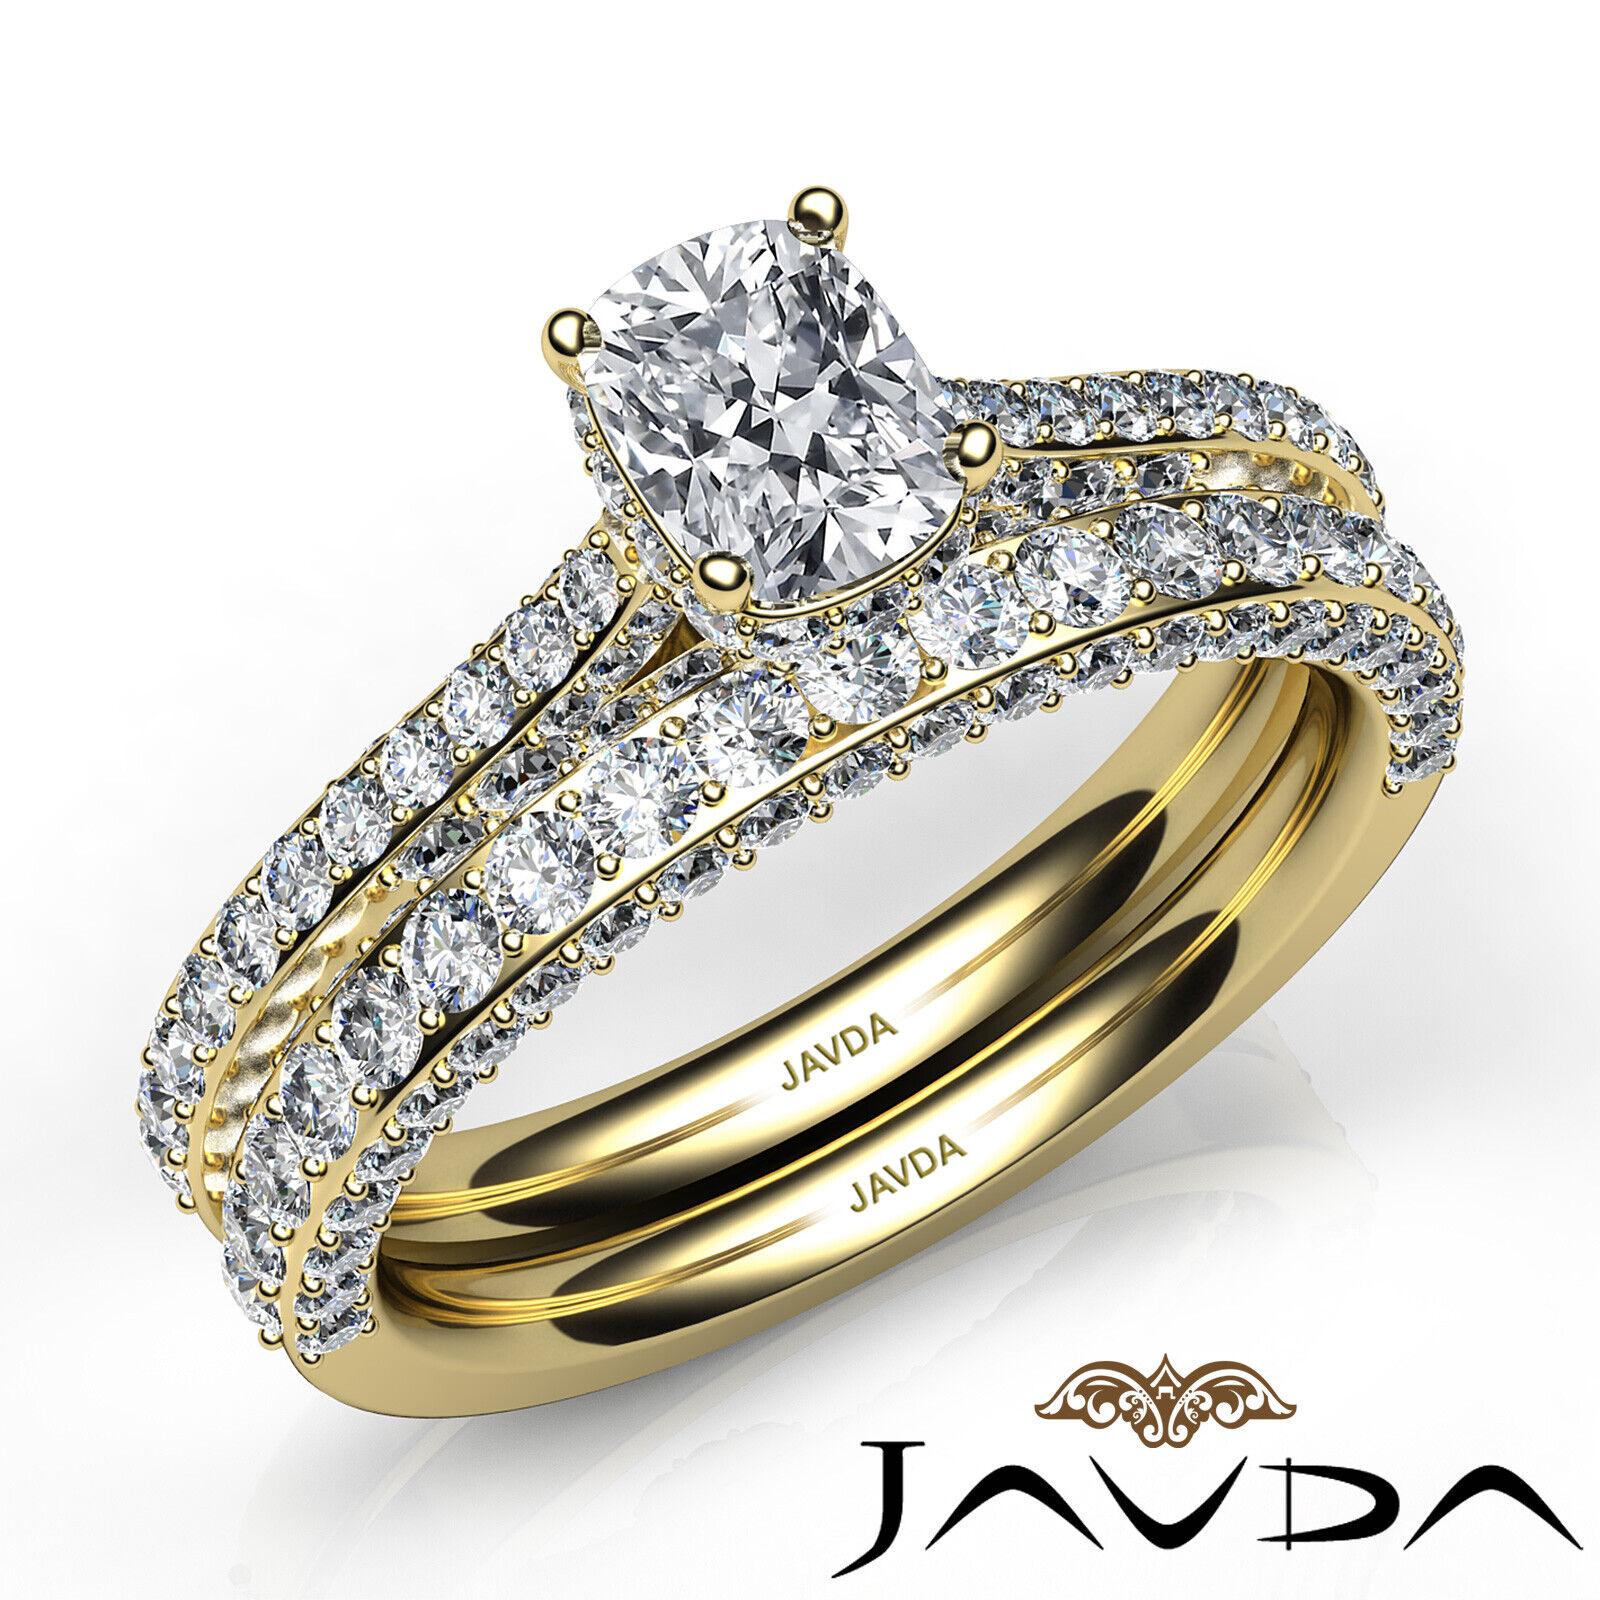 2.85ctw Pave Circa Halo Bridal Cushion Diamond Engagement Ring GIA F-VS1 W Gold 8